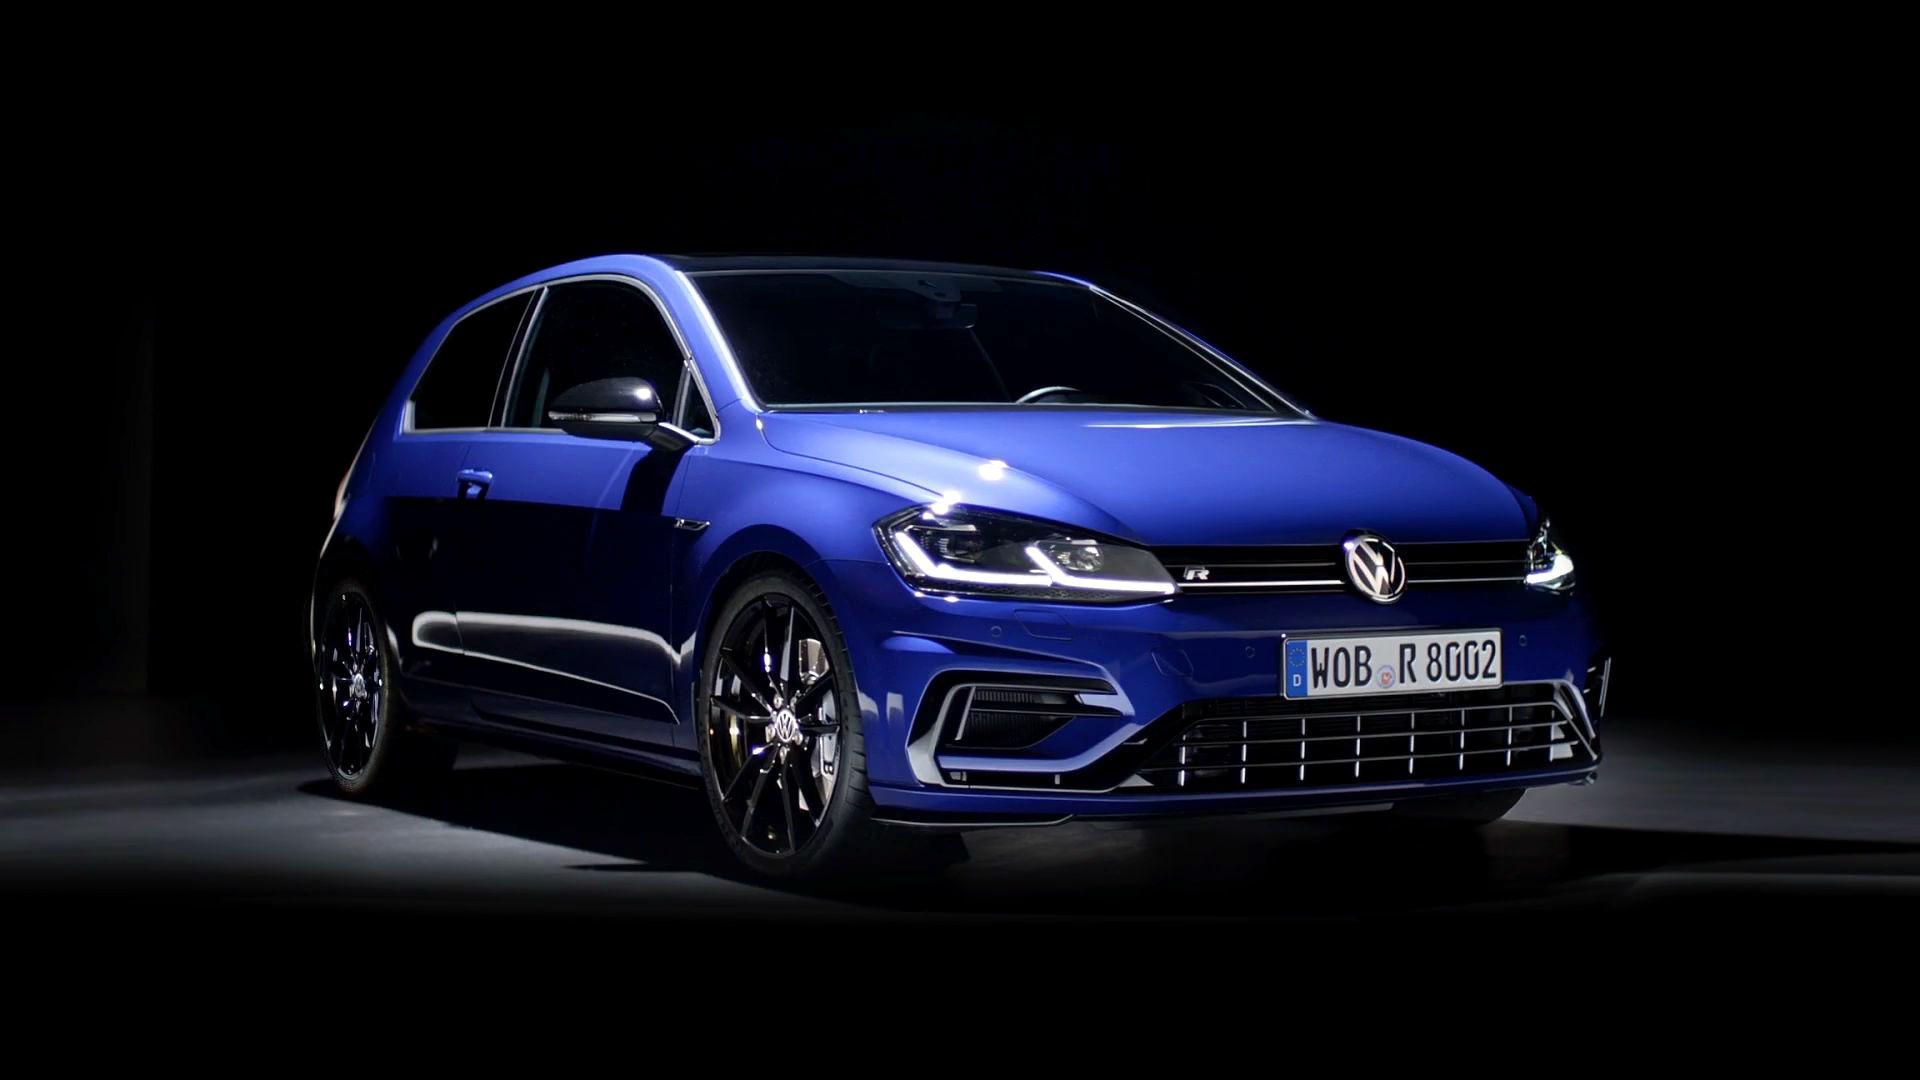 https://www.motor1.com/news/143520/vw-golf-r-performance-pack/ Volkswagen Golf R Official